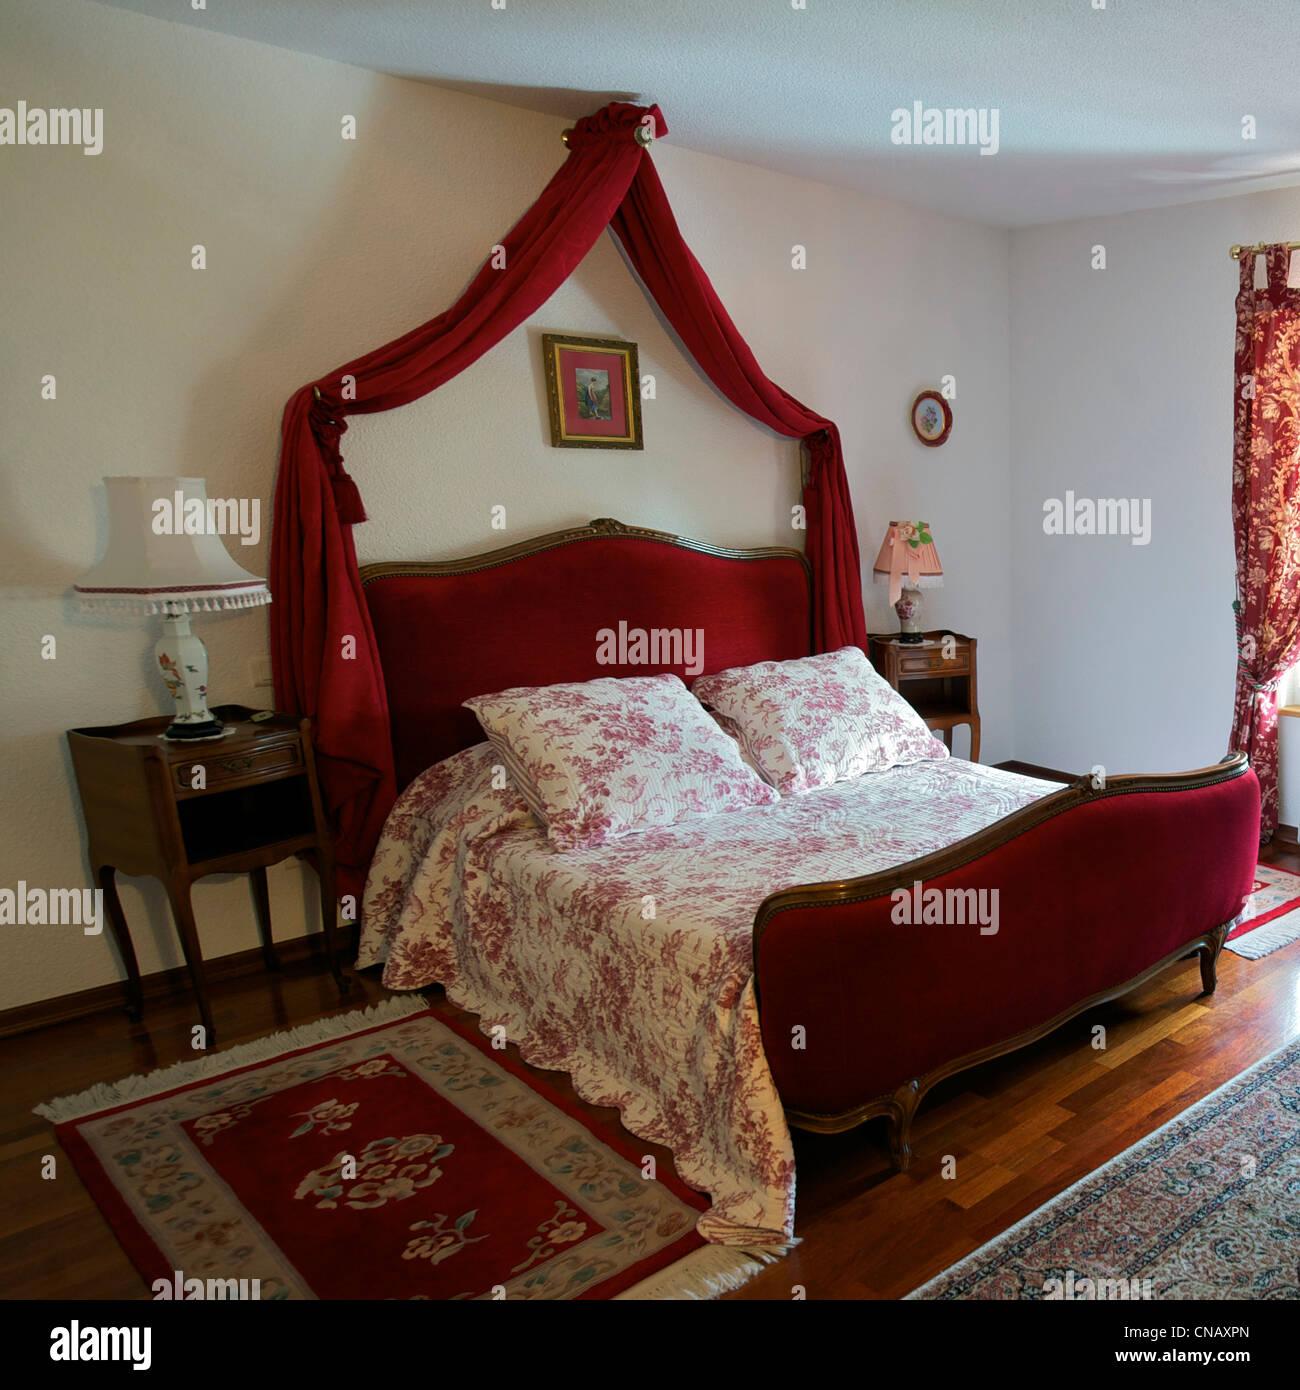 France, Haut Rhin, Rixheim La Grange a Elise, bed and breakfast - Stock Image